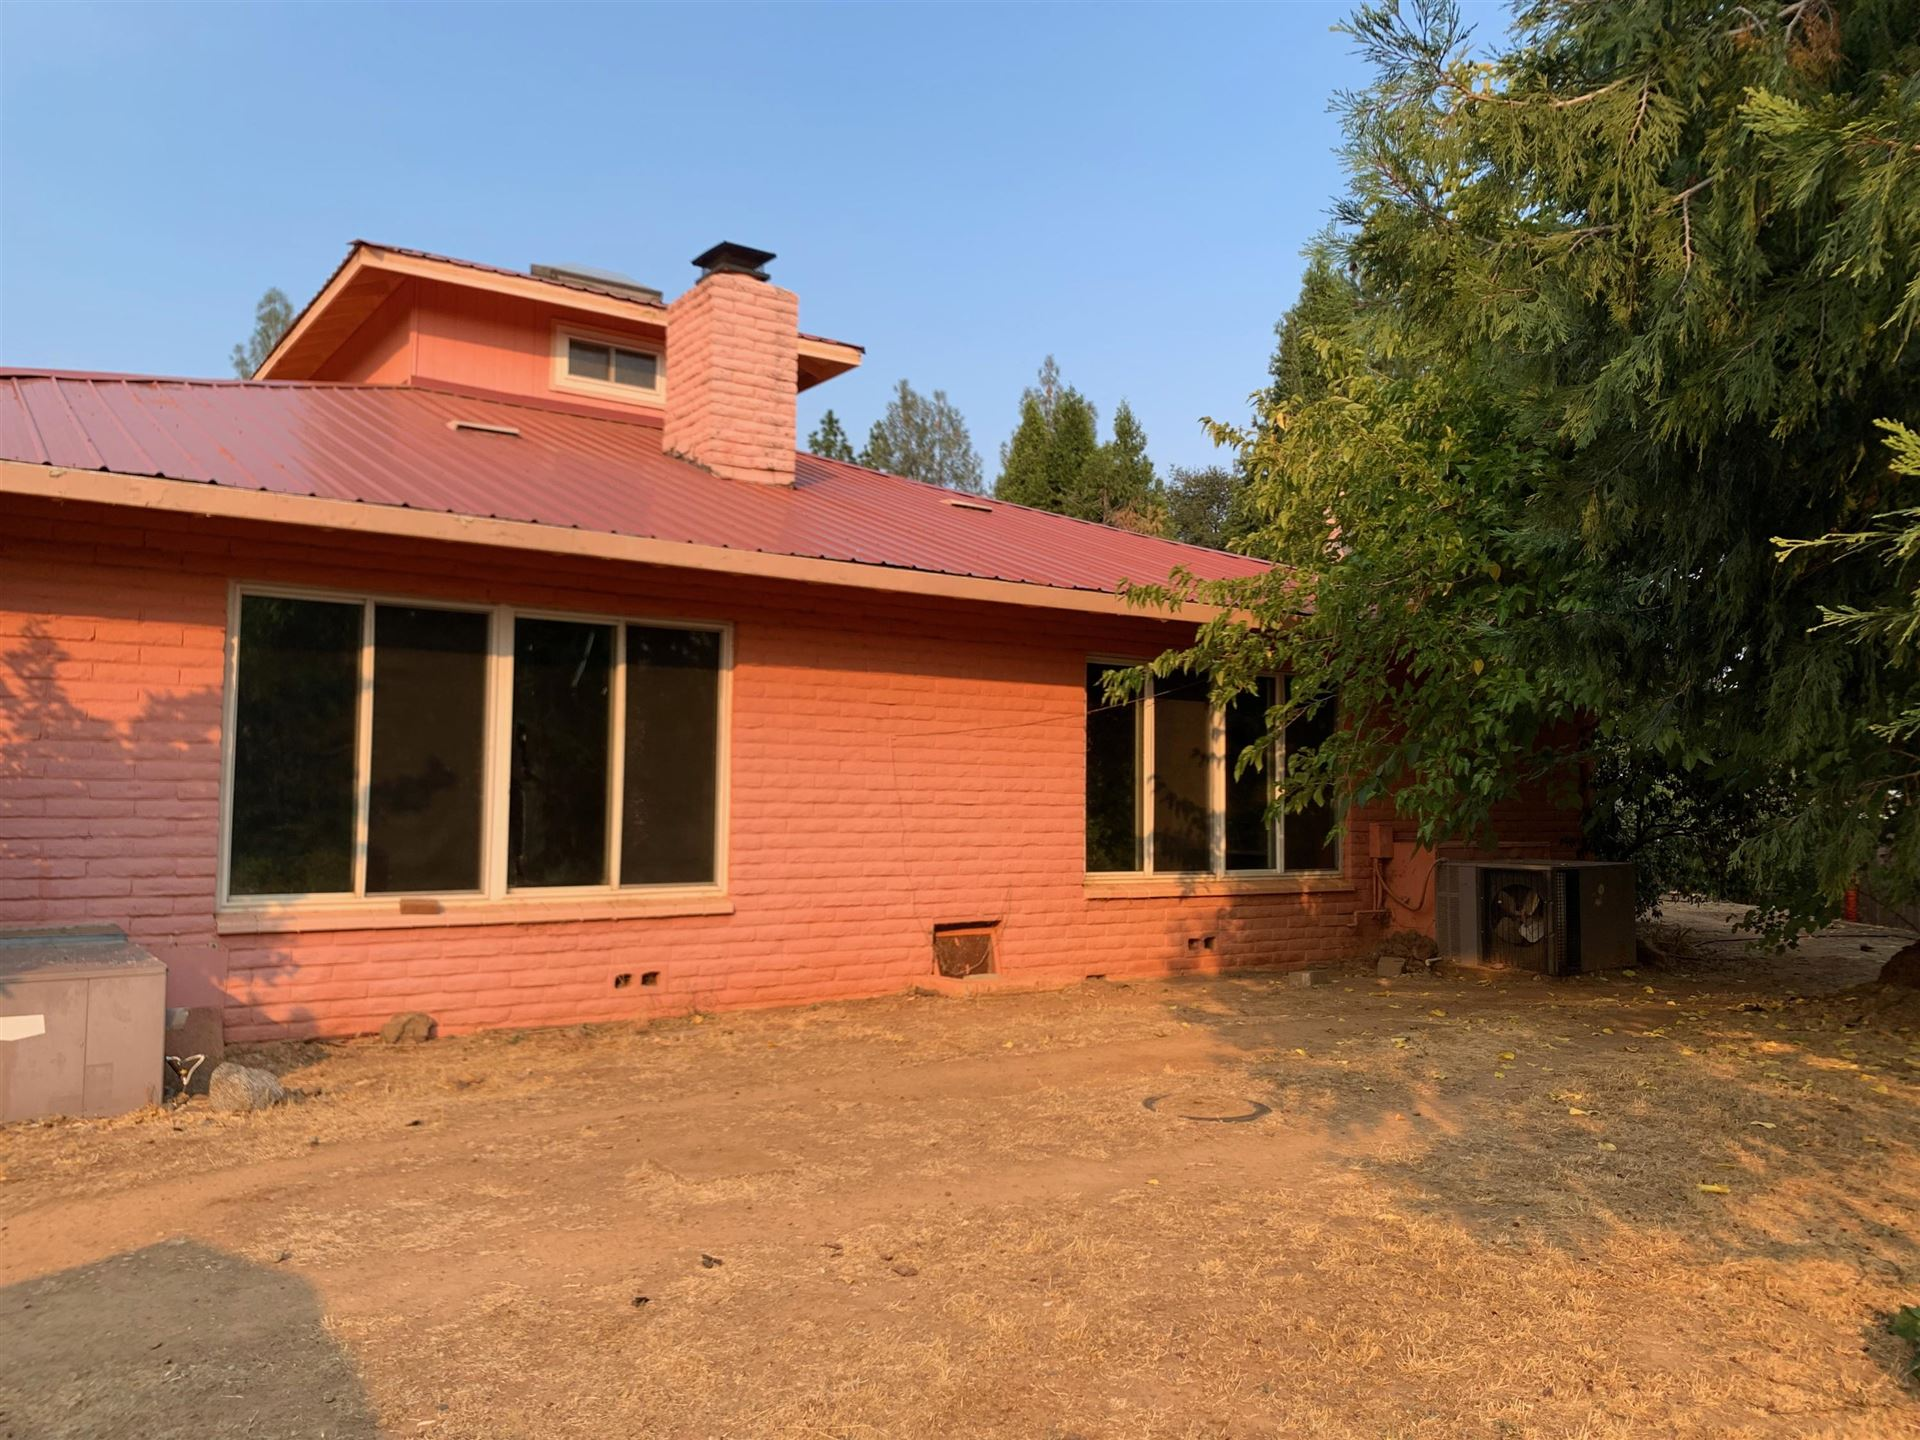 17923 Ranchera Rd, Shasta Lake, CA 96019 - MLS#: 21-4016